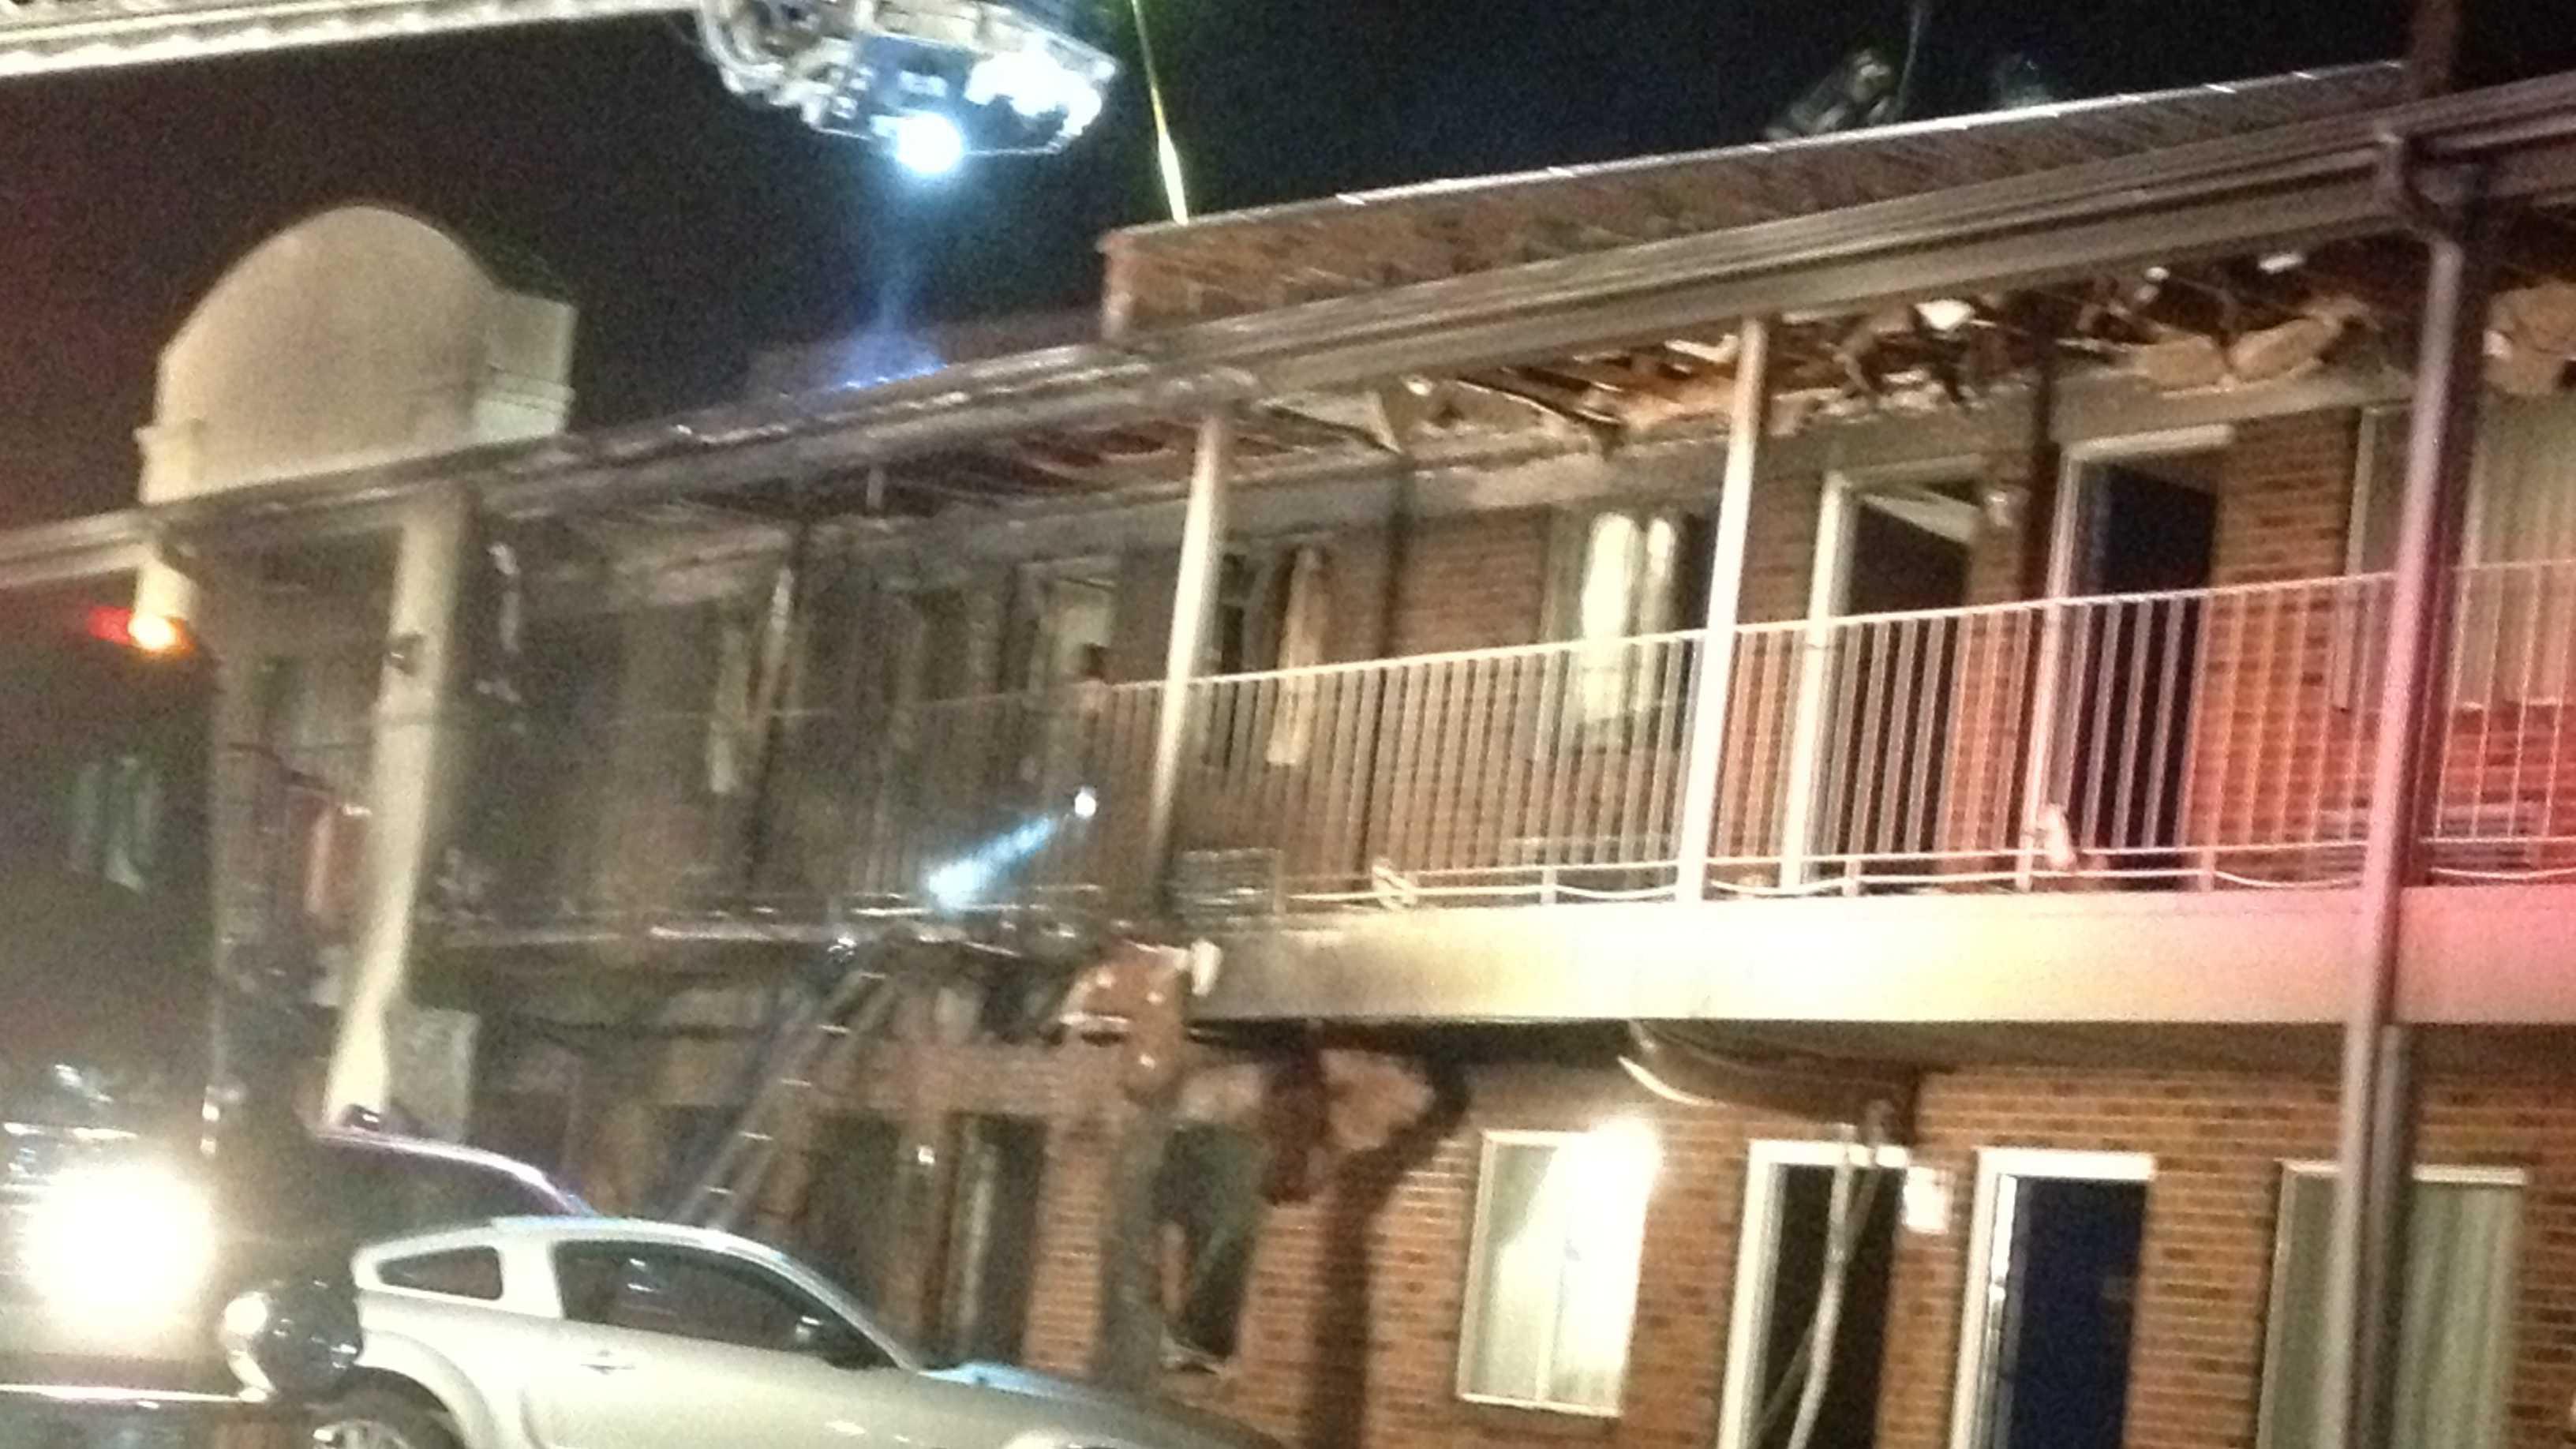 Days Inn Fire In Liberty